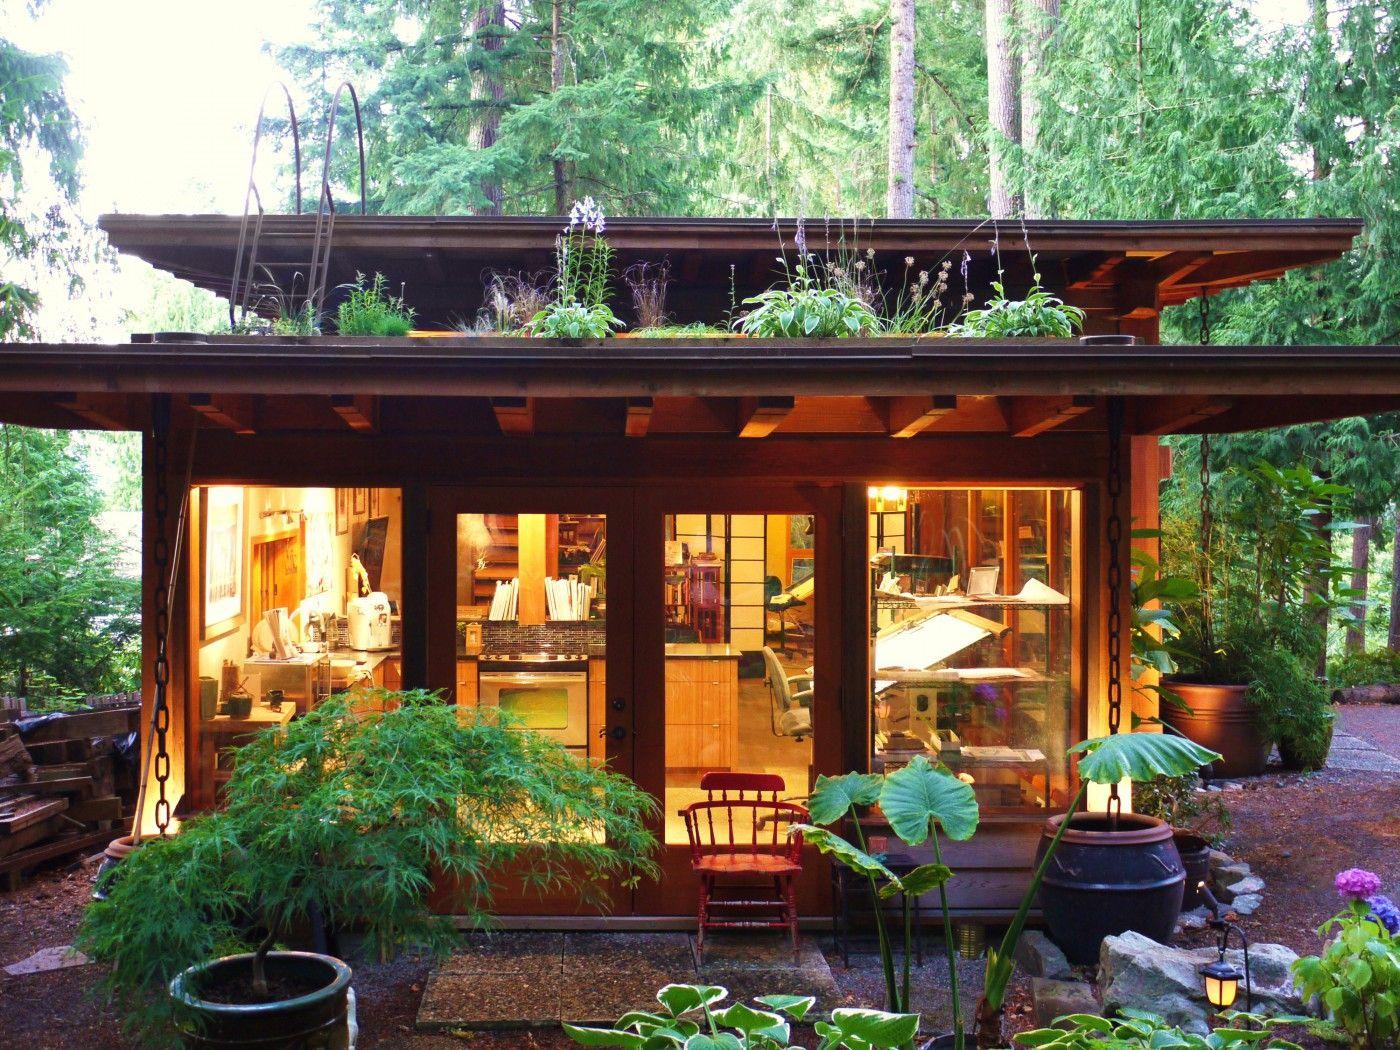 Tiny houses on pinterest - Kasl Family Tiny House A 207 A 207 Square Feet Tiny House On Wheels